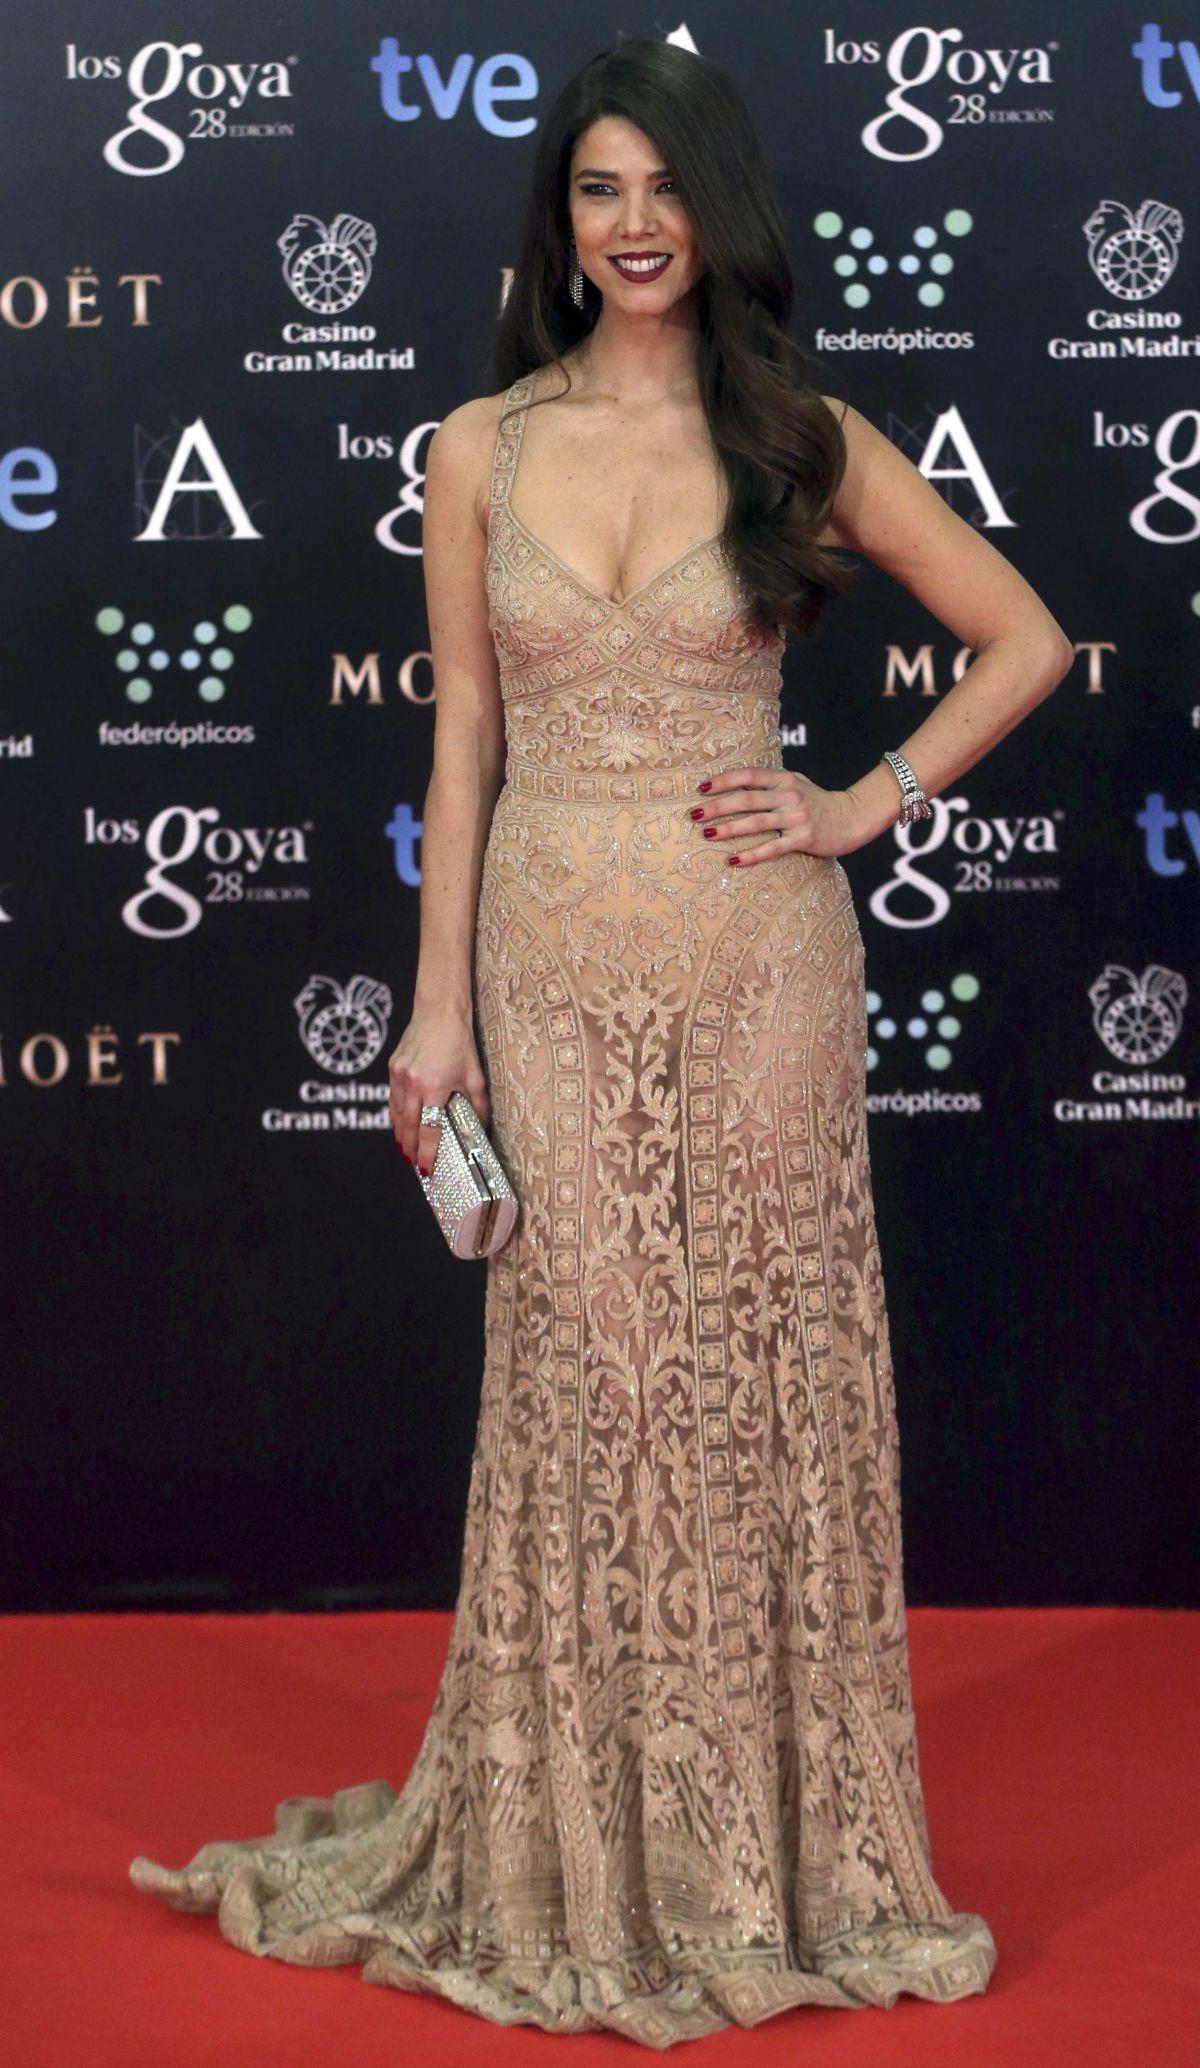 JUANA ACOSTA at 2014 Goya Film Awards in Madrid